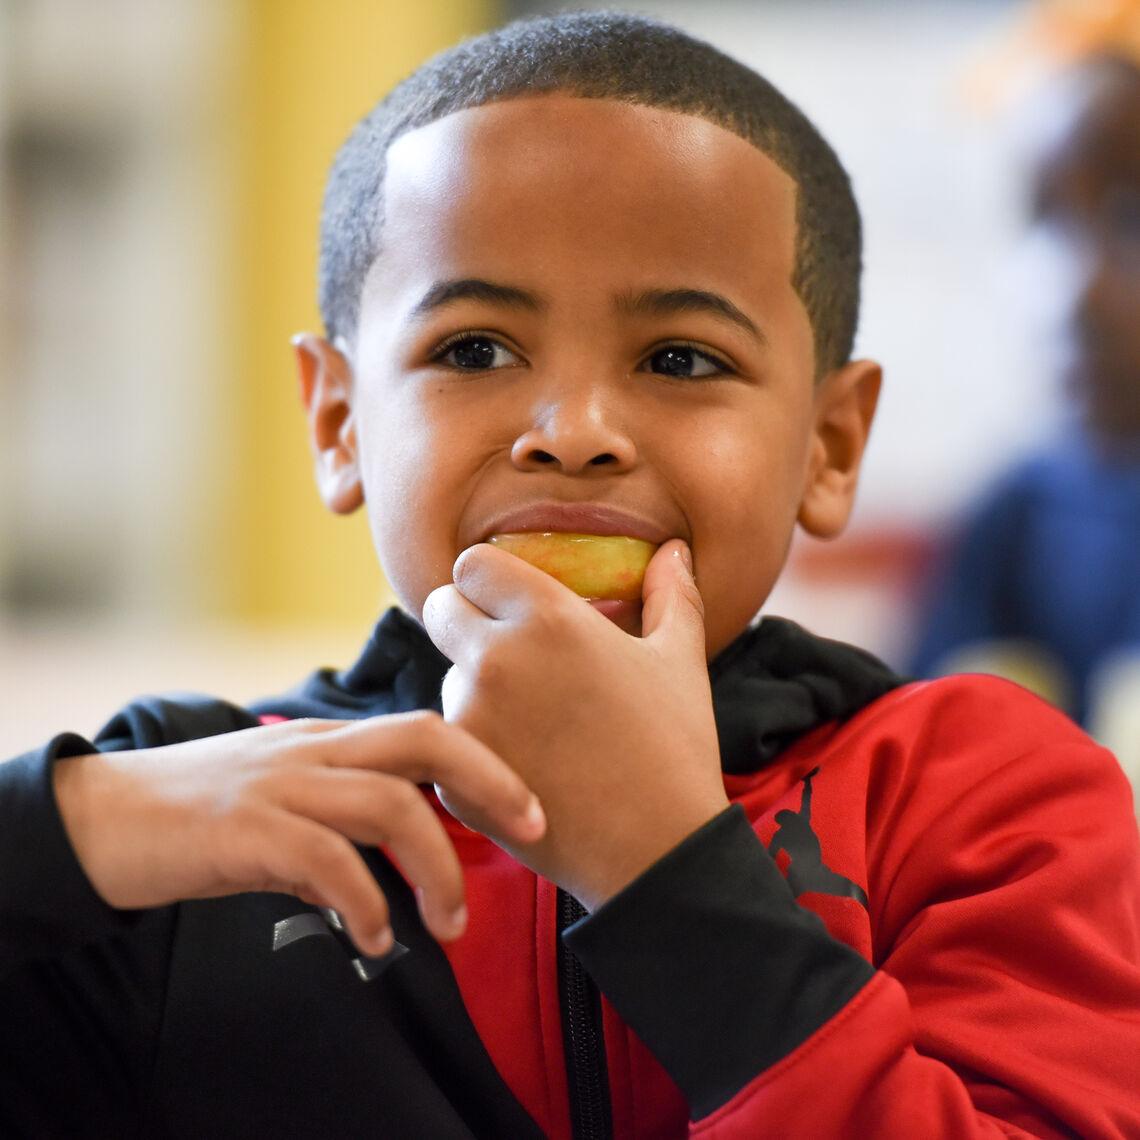 student eats breakfast in the classroom